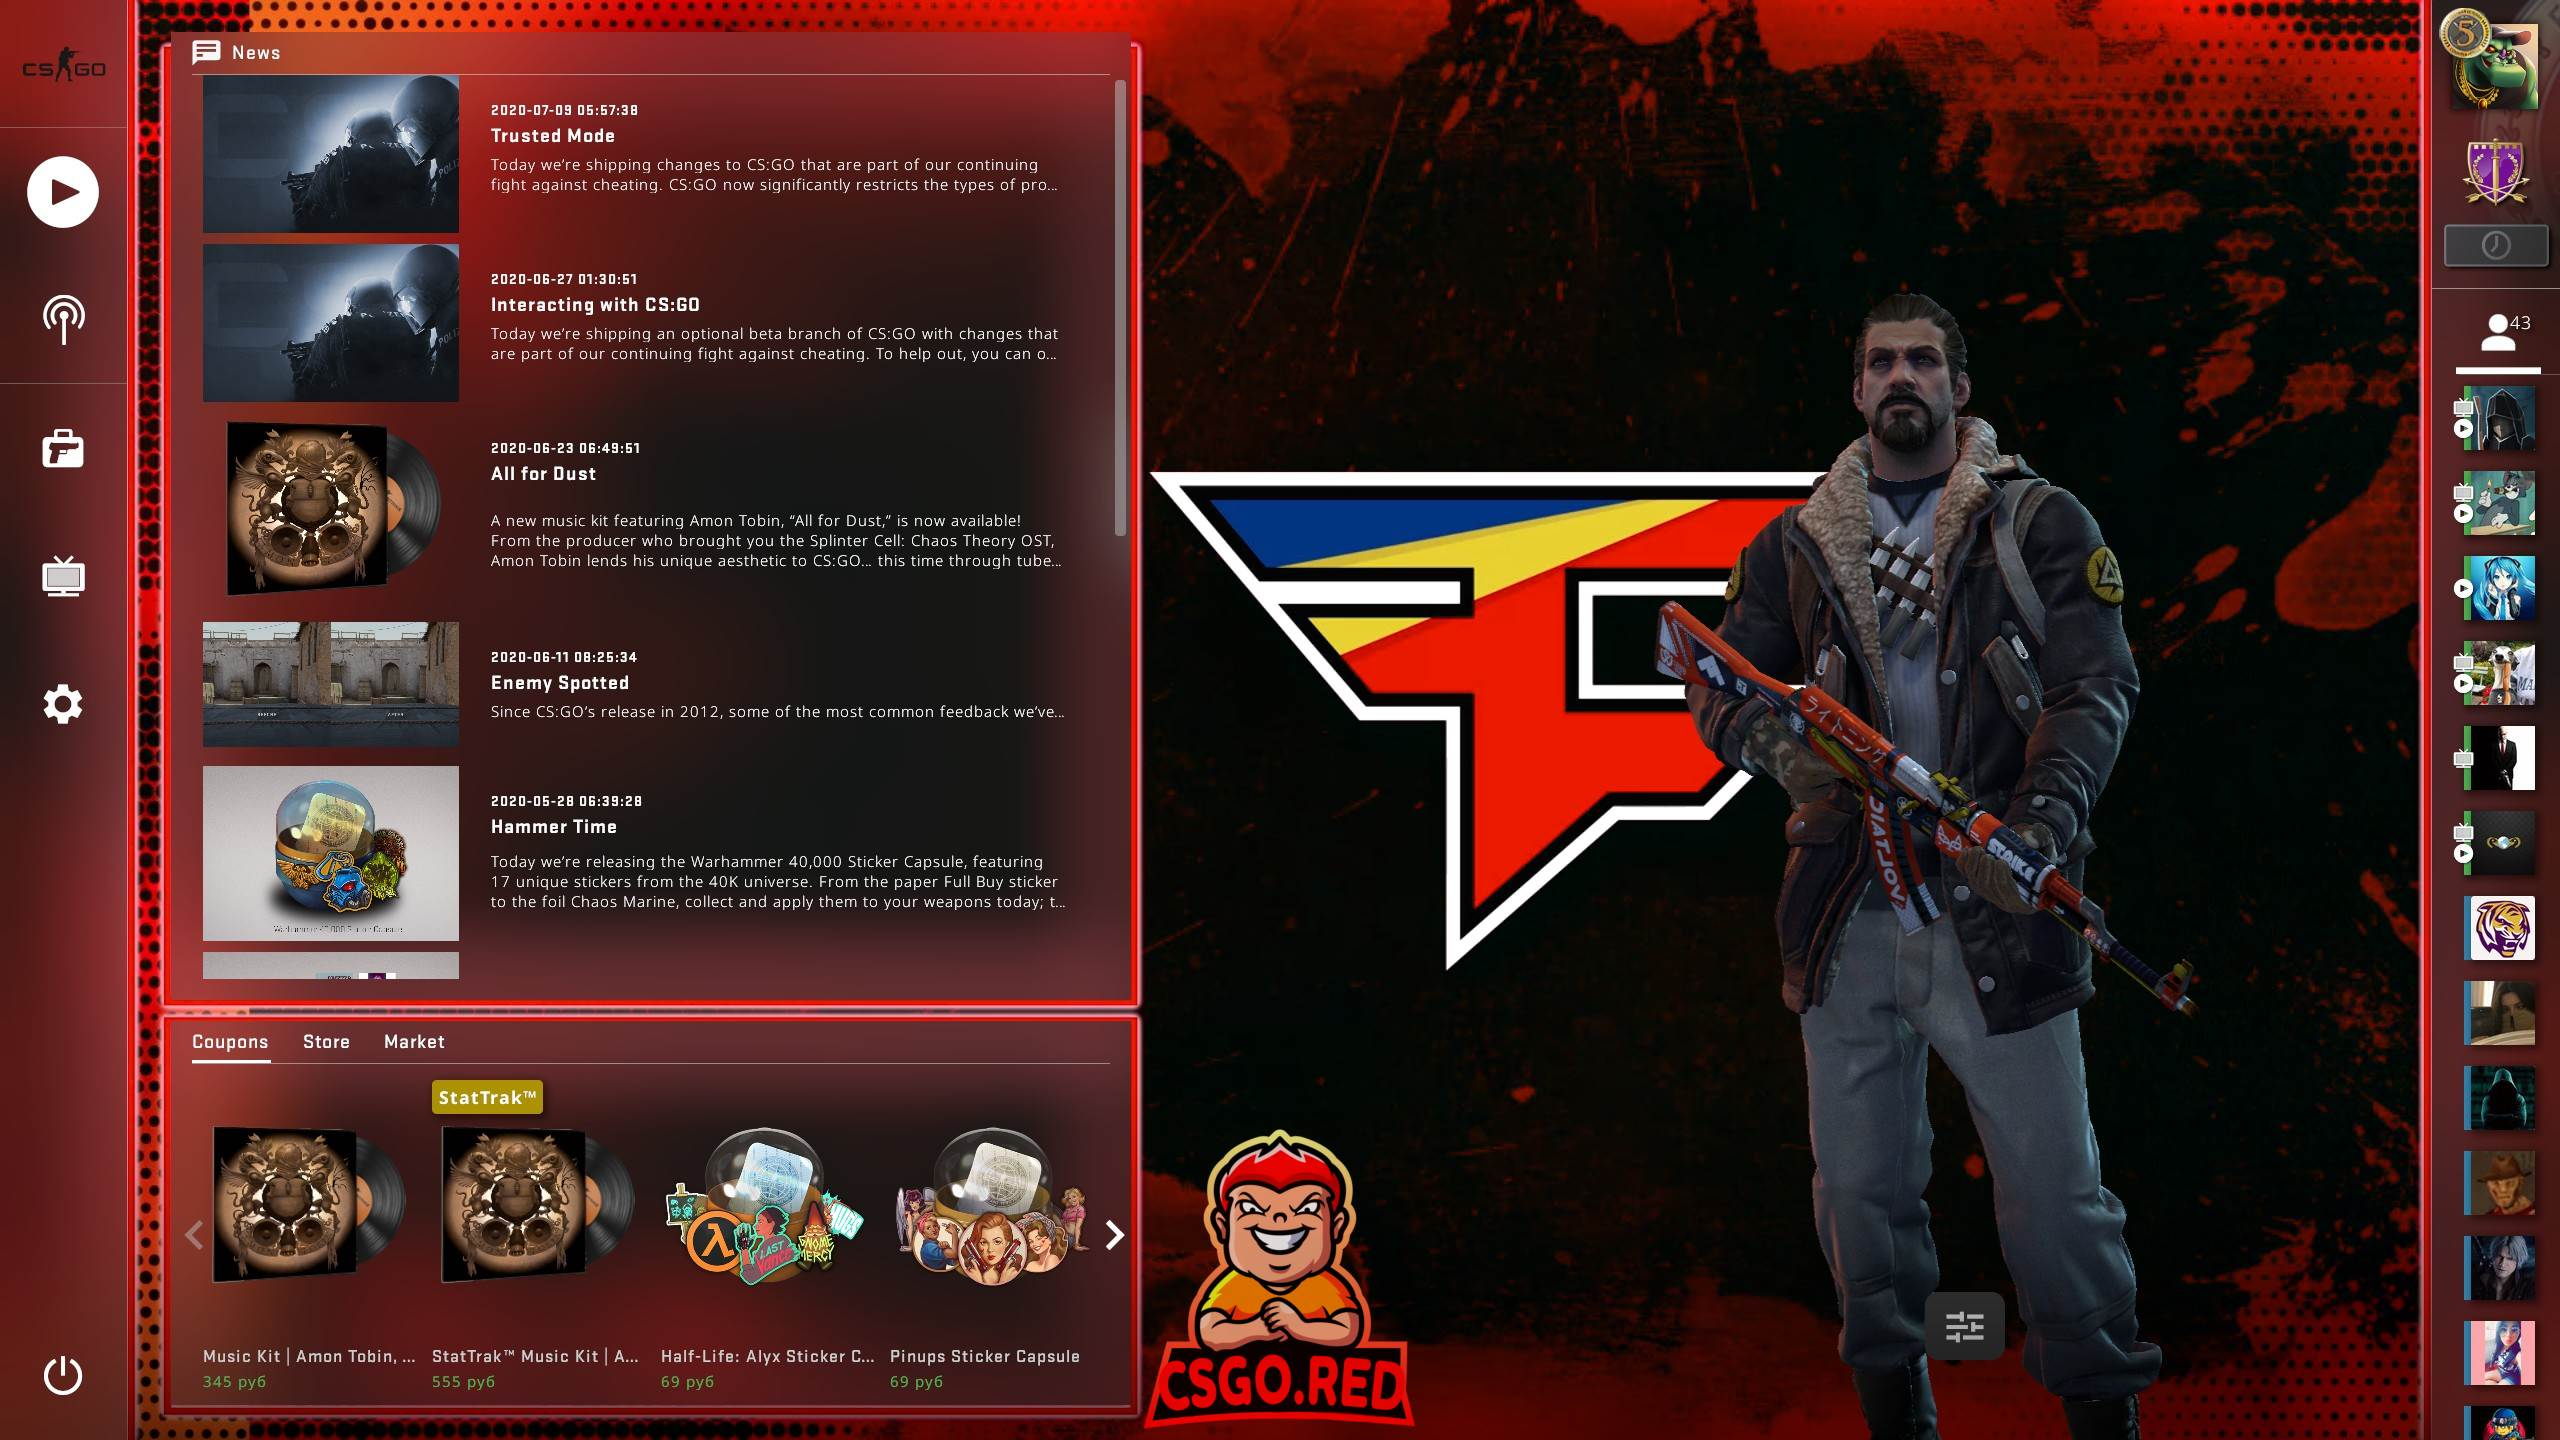 Faze Clan Panorama UI Background